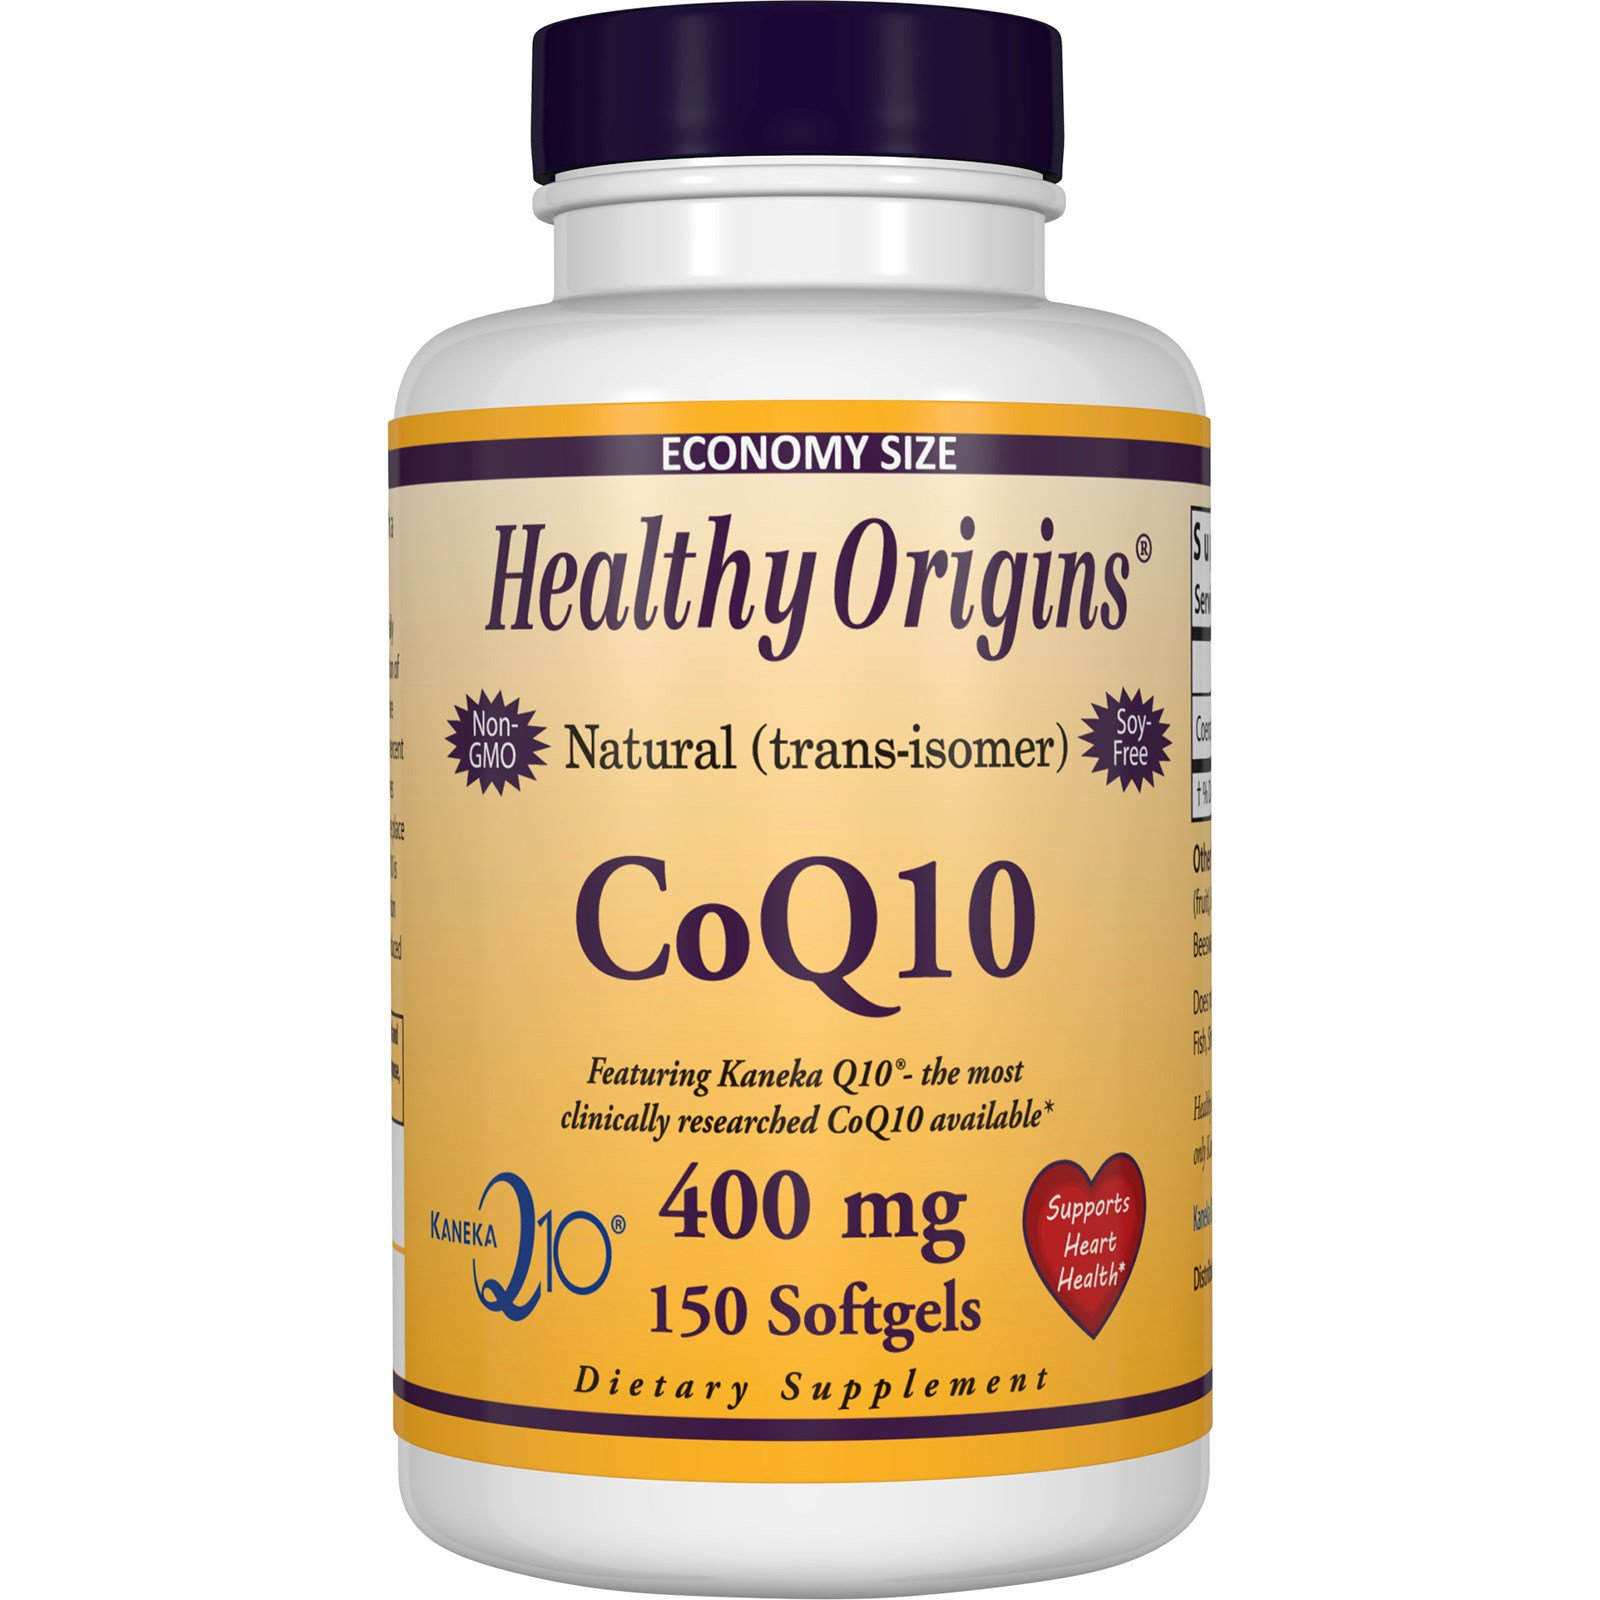 Healthy Origins, CoQ10 капсулы, (Kaneka Q10), 400 мг, 150 желатиновых капсул